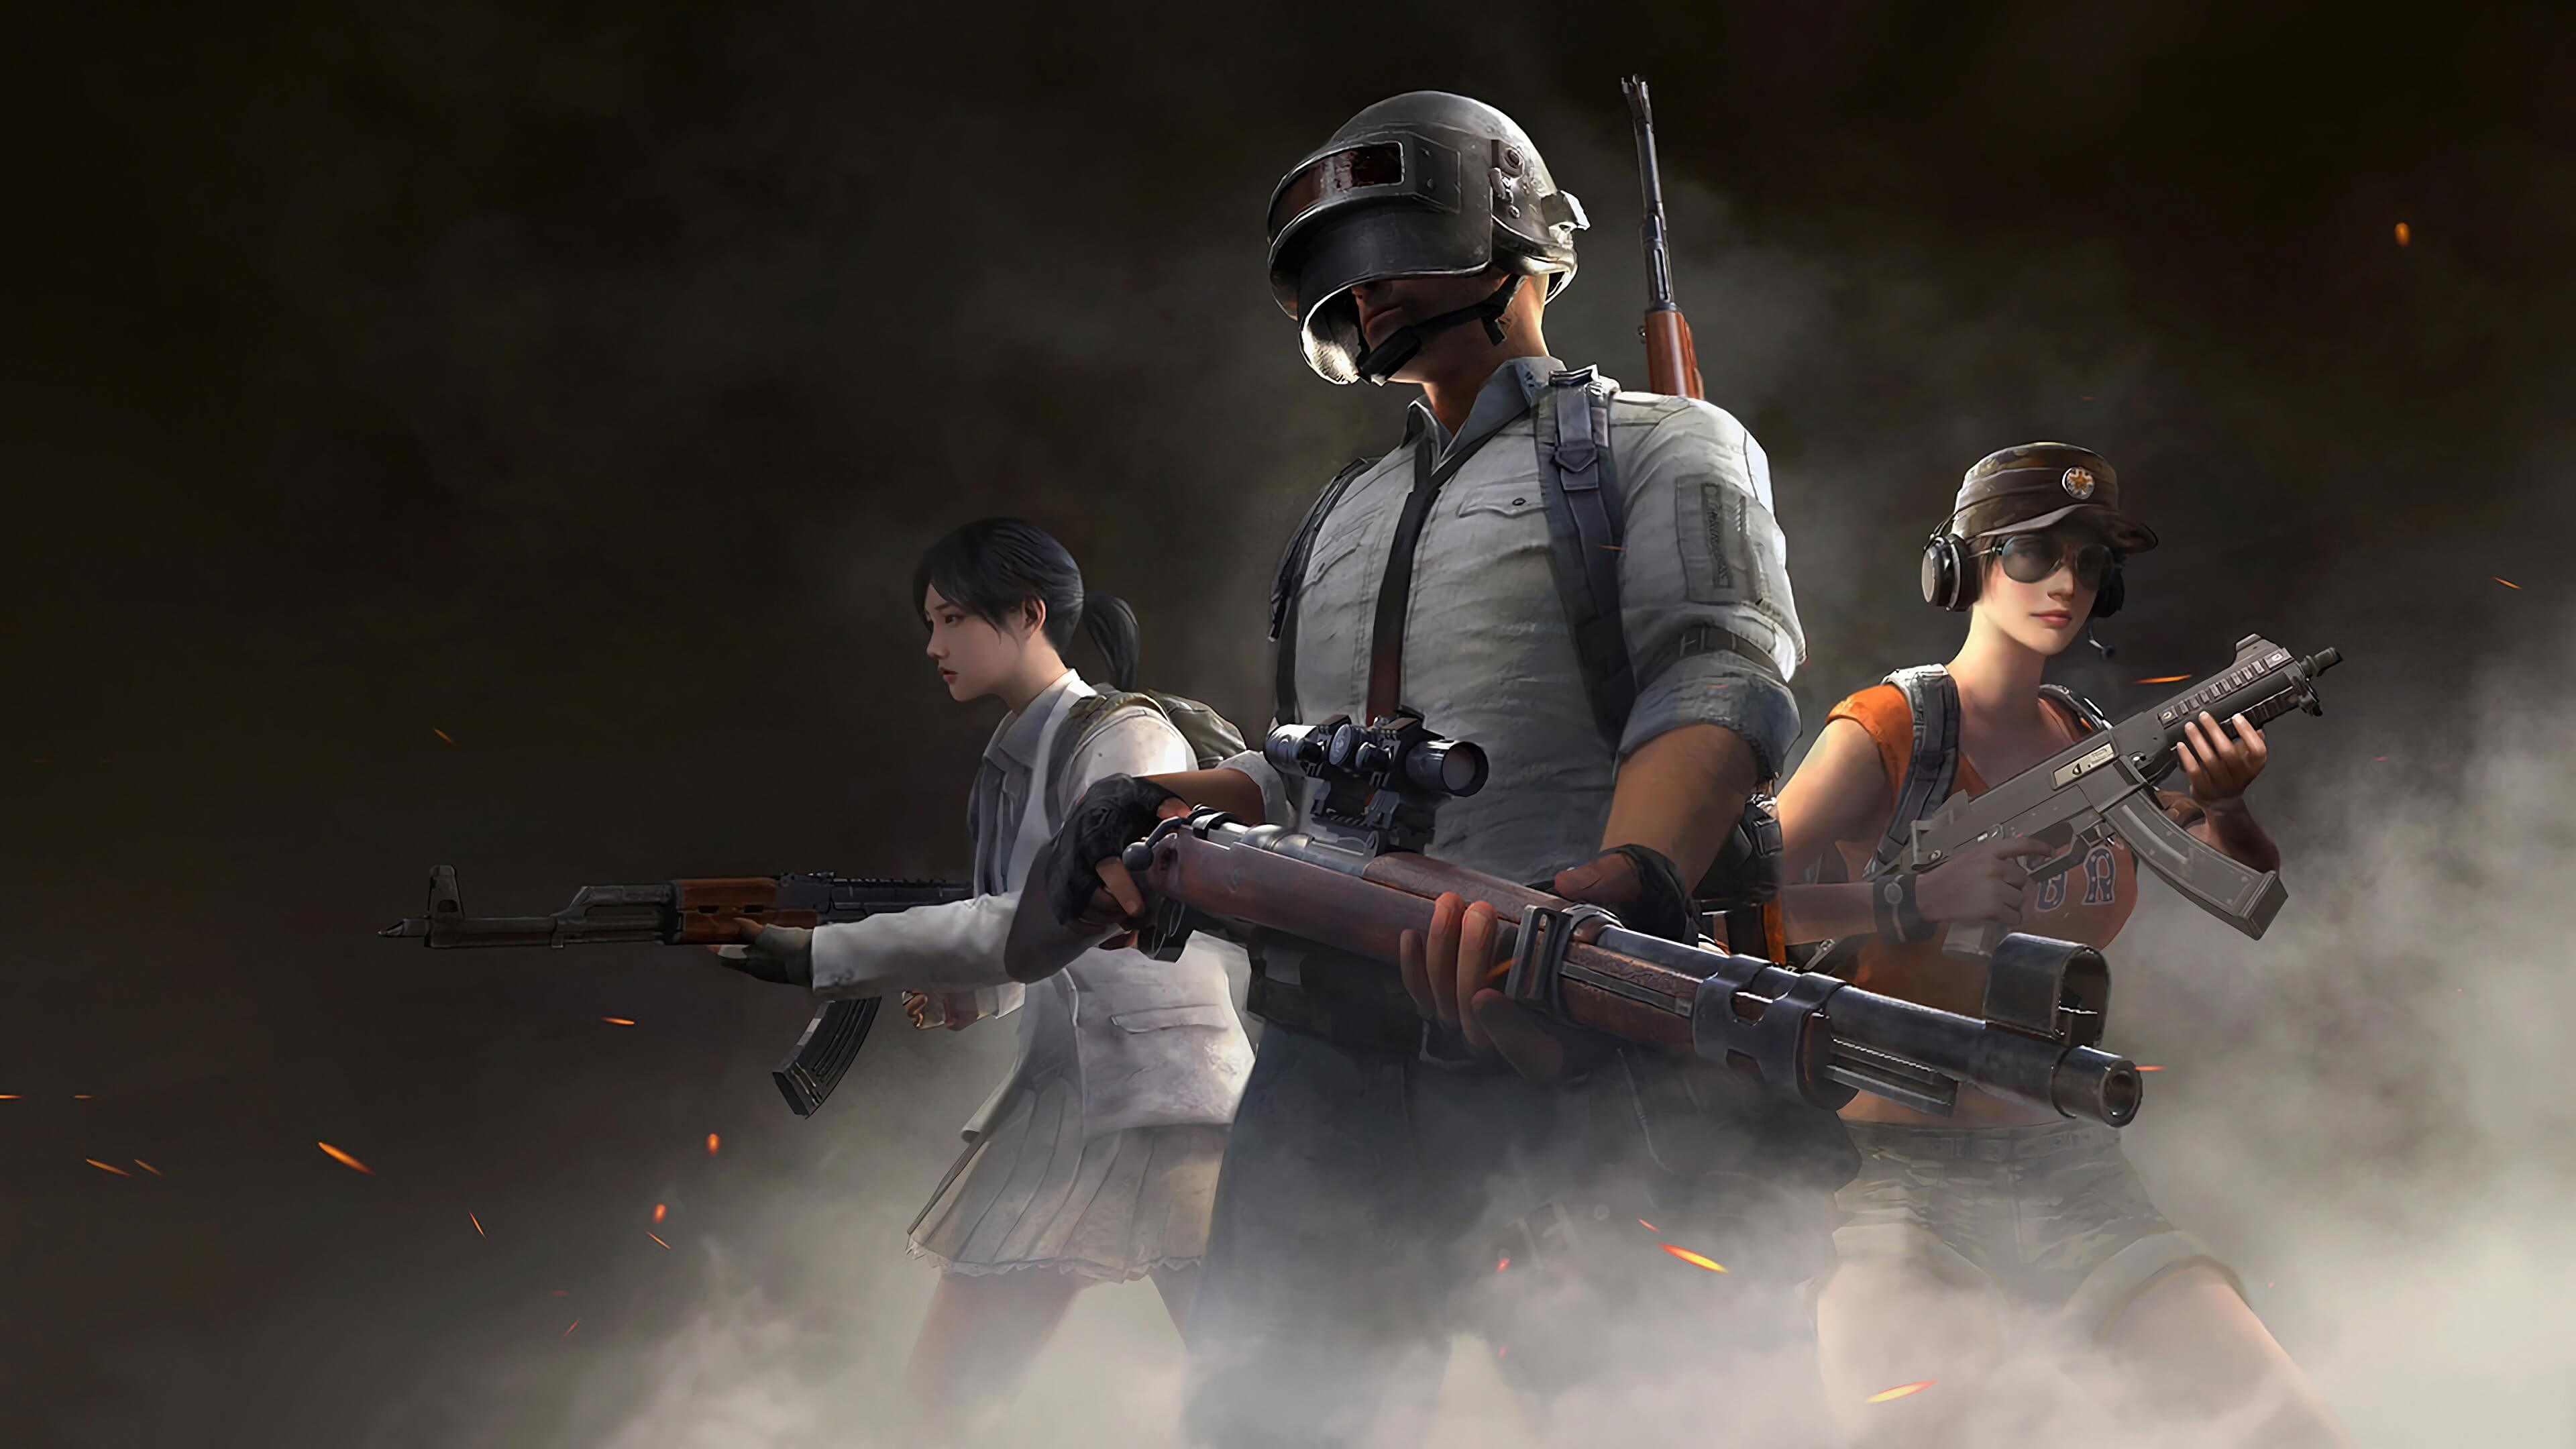 Обои PlayerUnknown's Battlegrounds три игрока